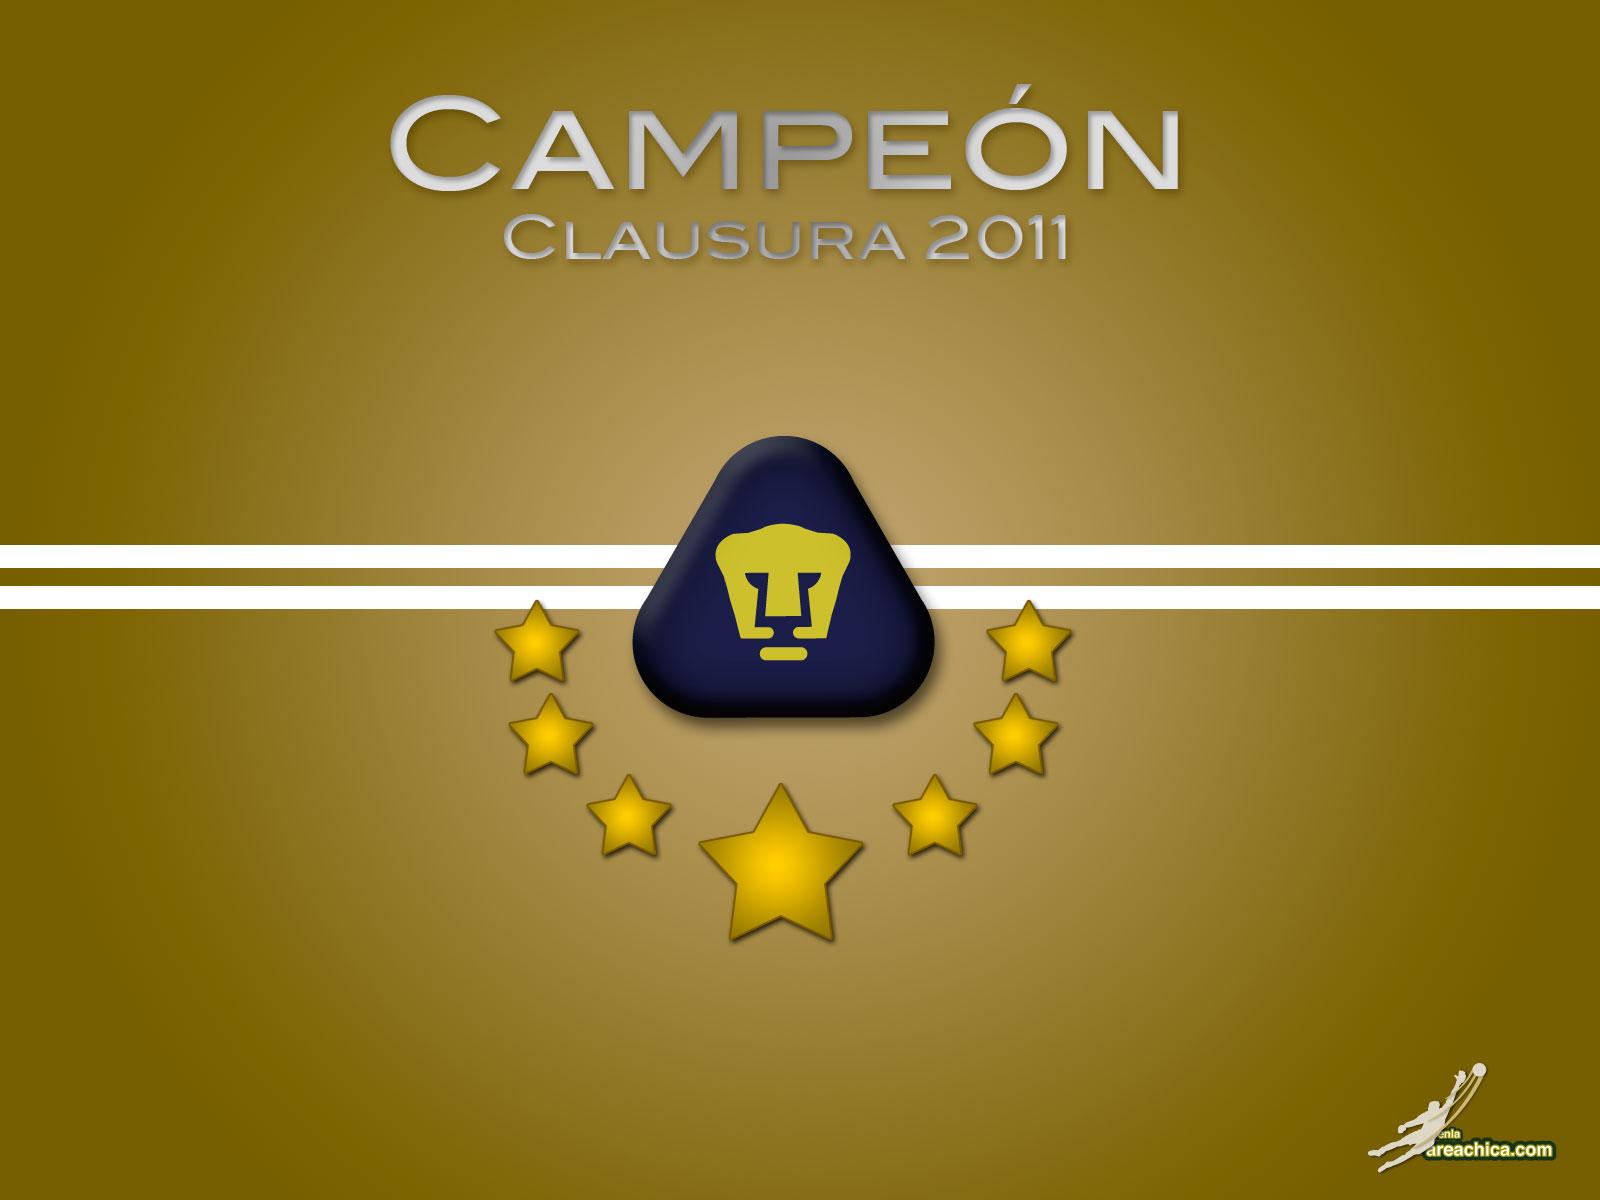 http://1.bp.blogspot.com/-kQ1mkFlJ1Bs/Te45laE2OvI/AAAAAAAAAAU/uznpUcVr4k8/s1600/wallpaper-Pumas-Campeon2.jpg